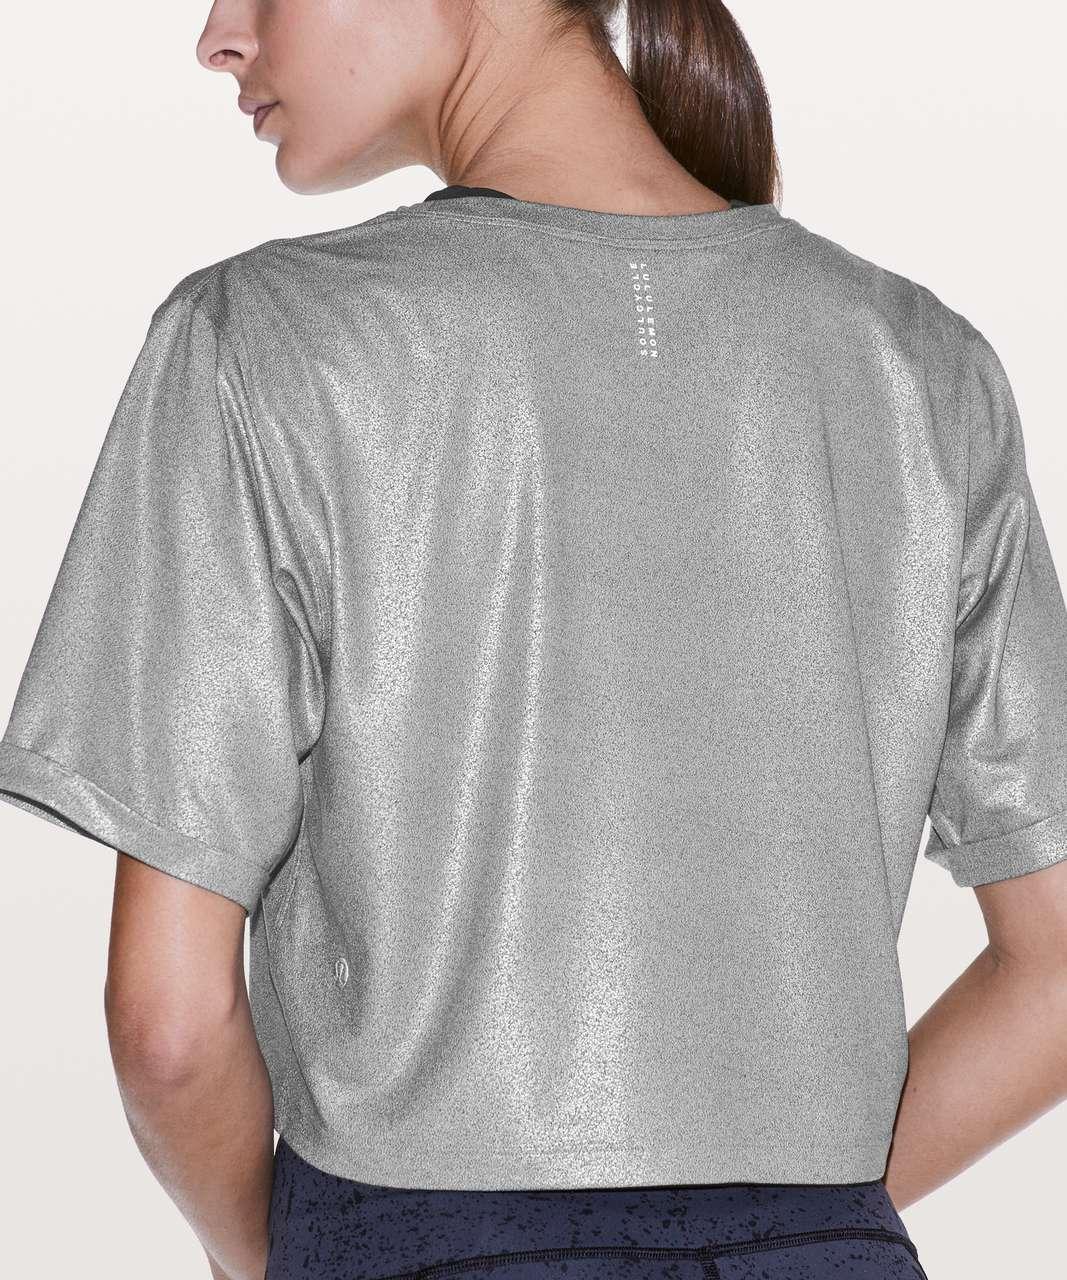 Lululemon To The Beat Tee *lululemon X SoulCycle - Luminosity Foil Print Heathered Metal Grey Silver Foil